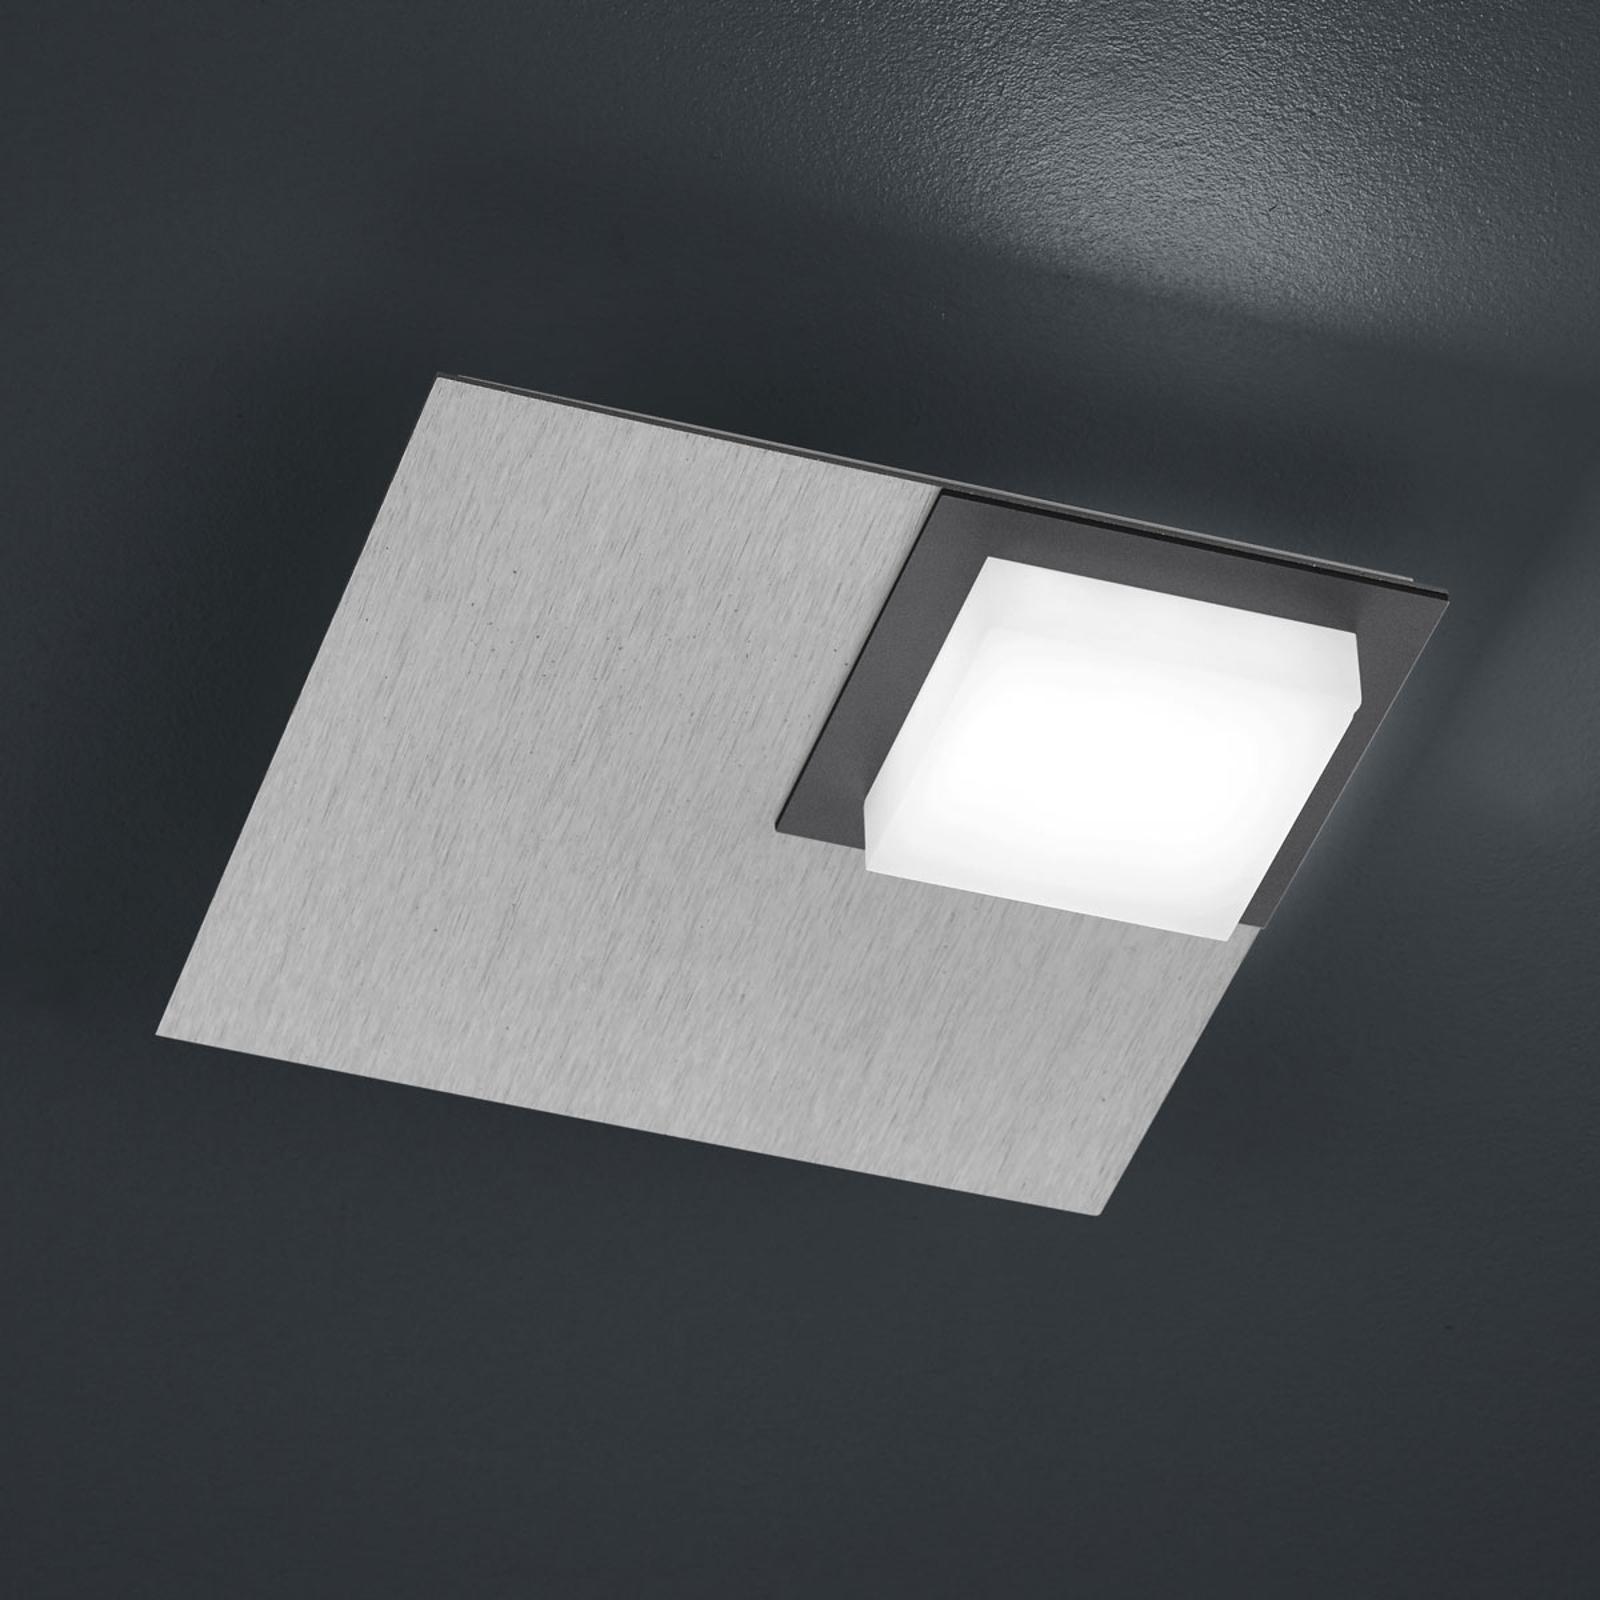 BANKAMP Quadro plafoniera LED 8W argento